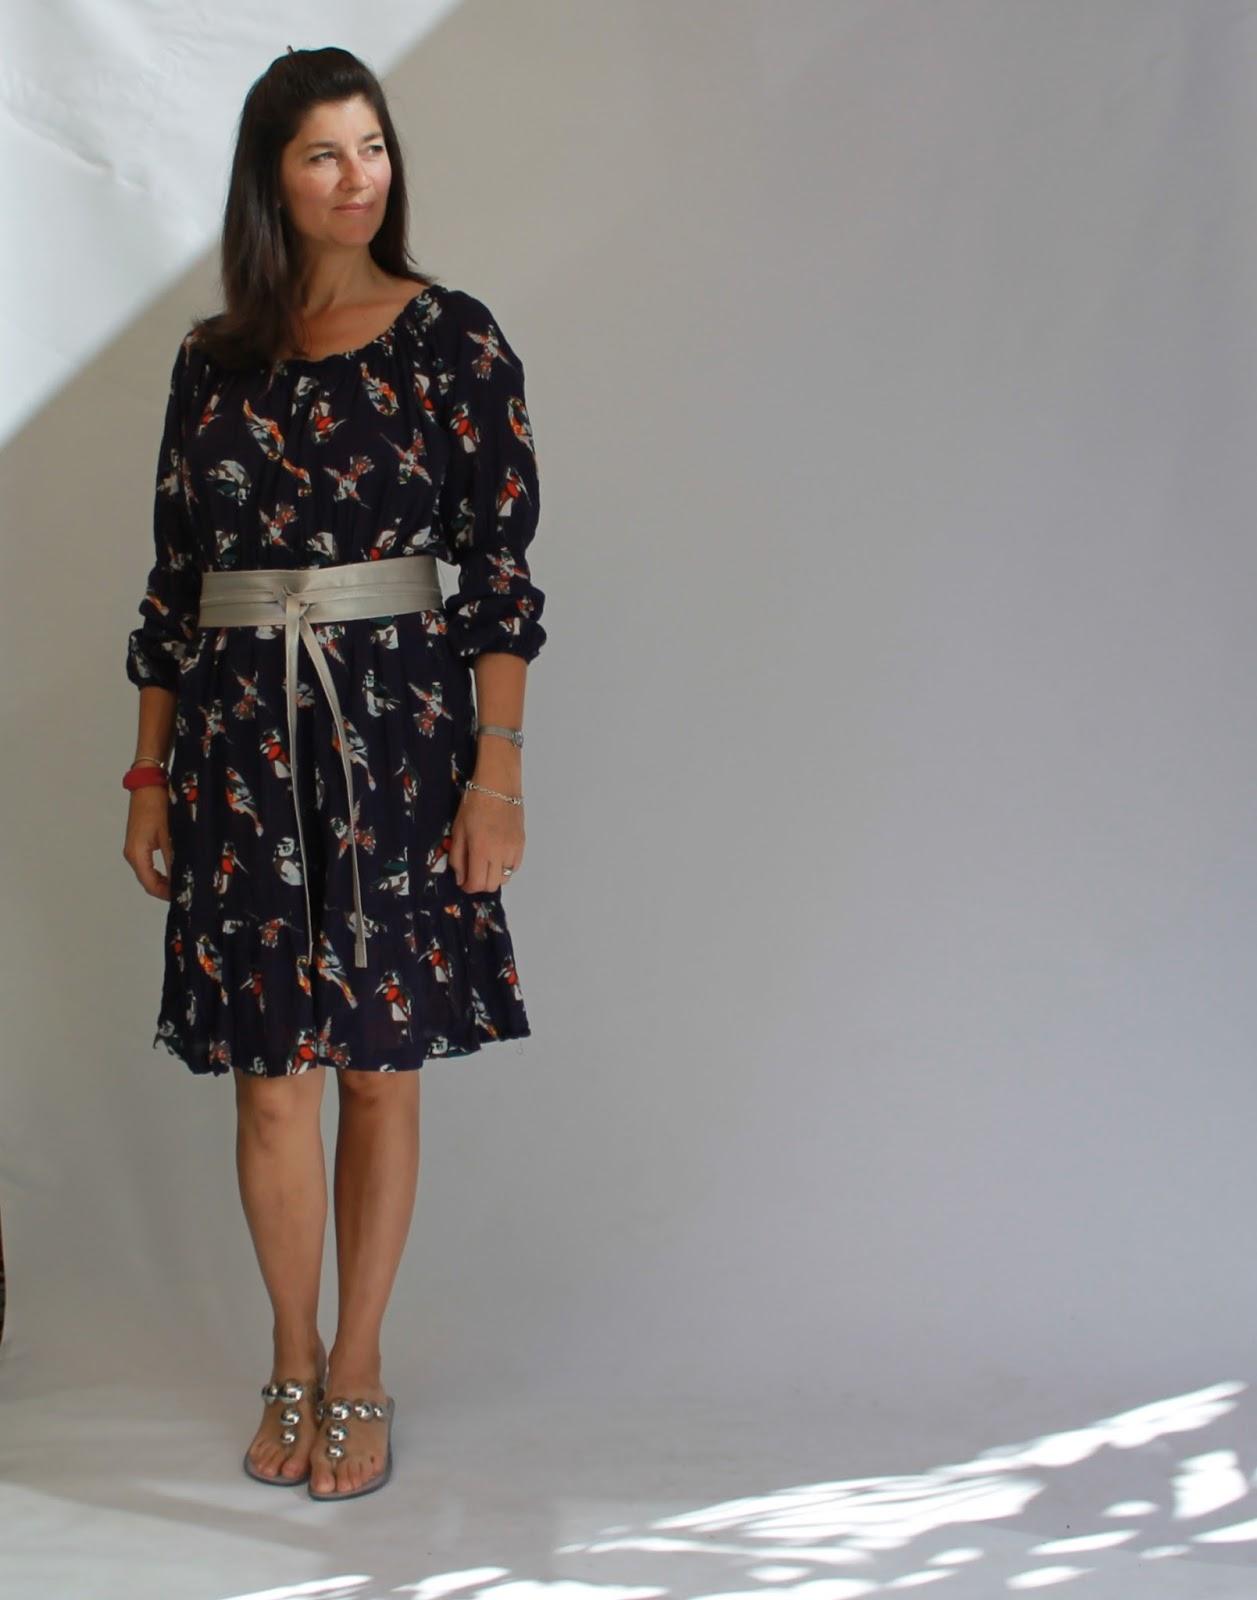 5842f540d2b meggipeg: Marie Gathered Midi Dress - Named Royals Collection